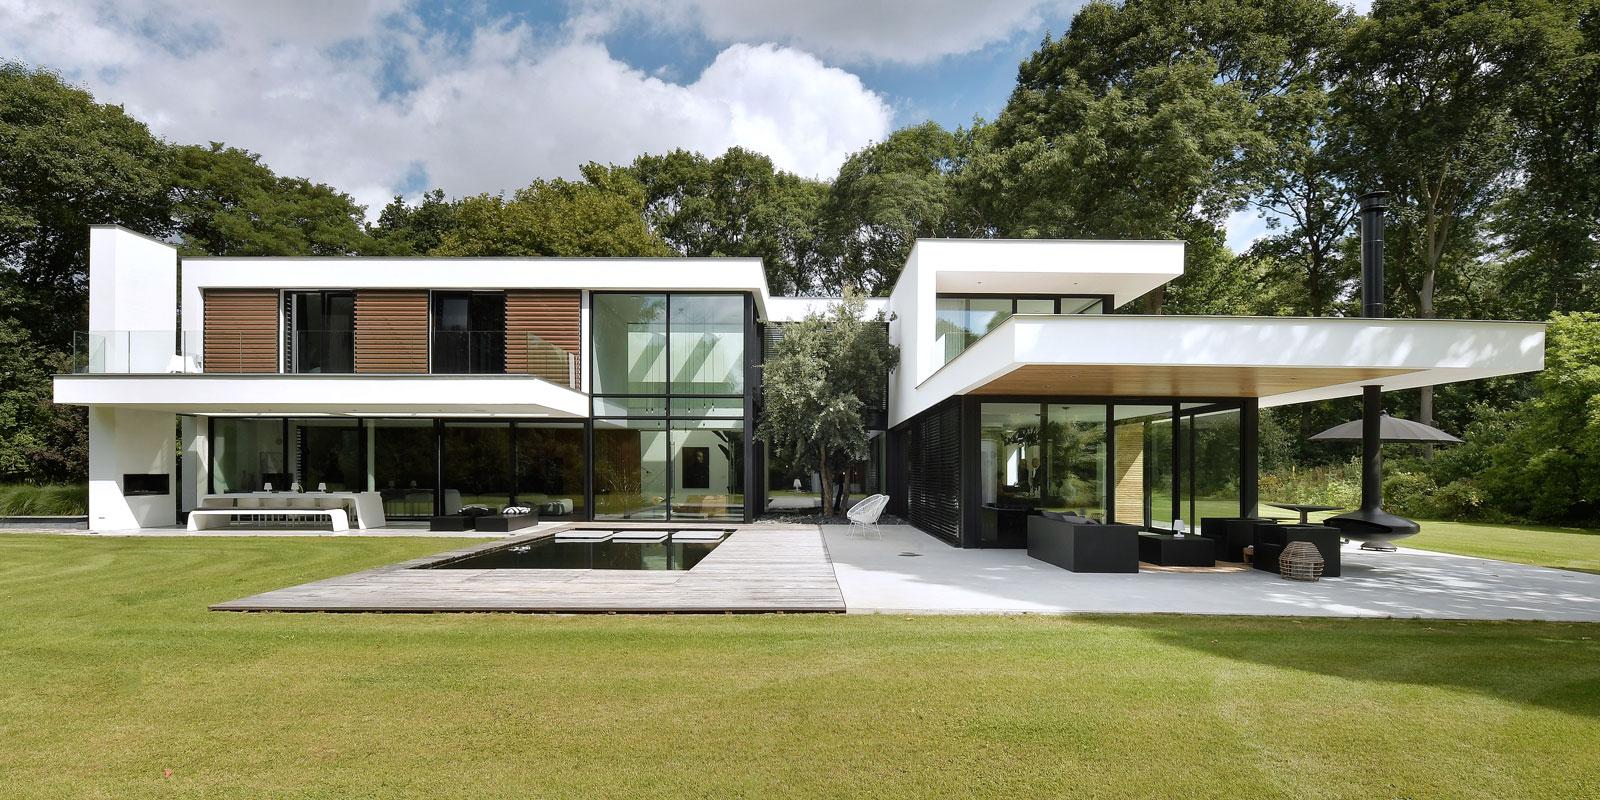 luxe villa, lab32 architecten, moderne villa, villa bouwen, villa ontwerpen, strak interieur, interieurontwerper, the art of living, event, woonbeurs